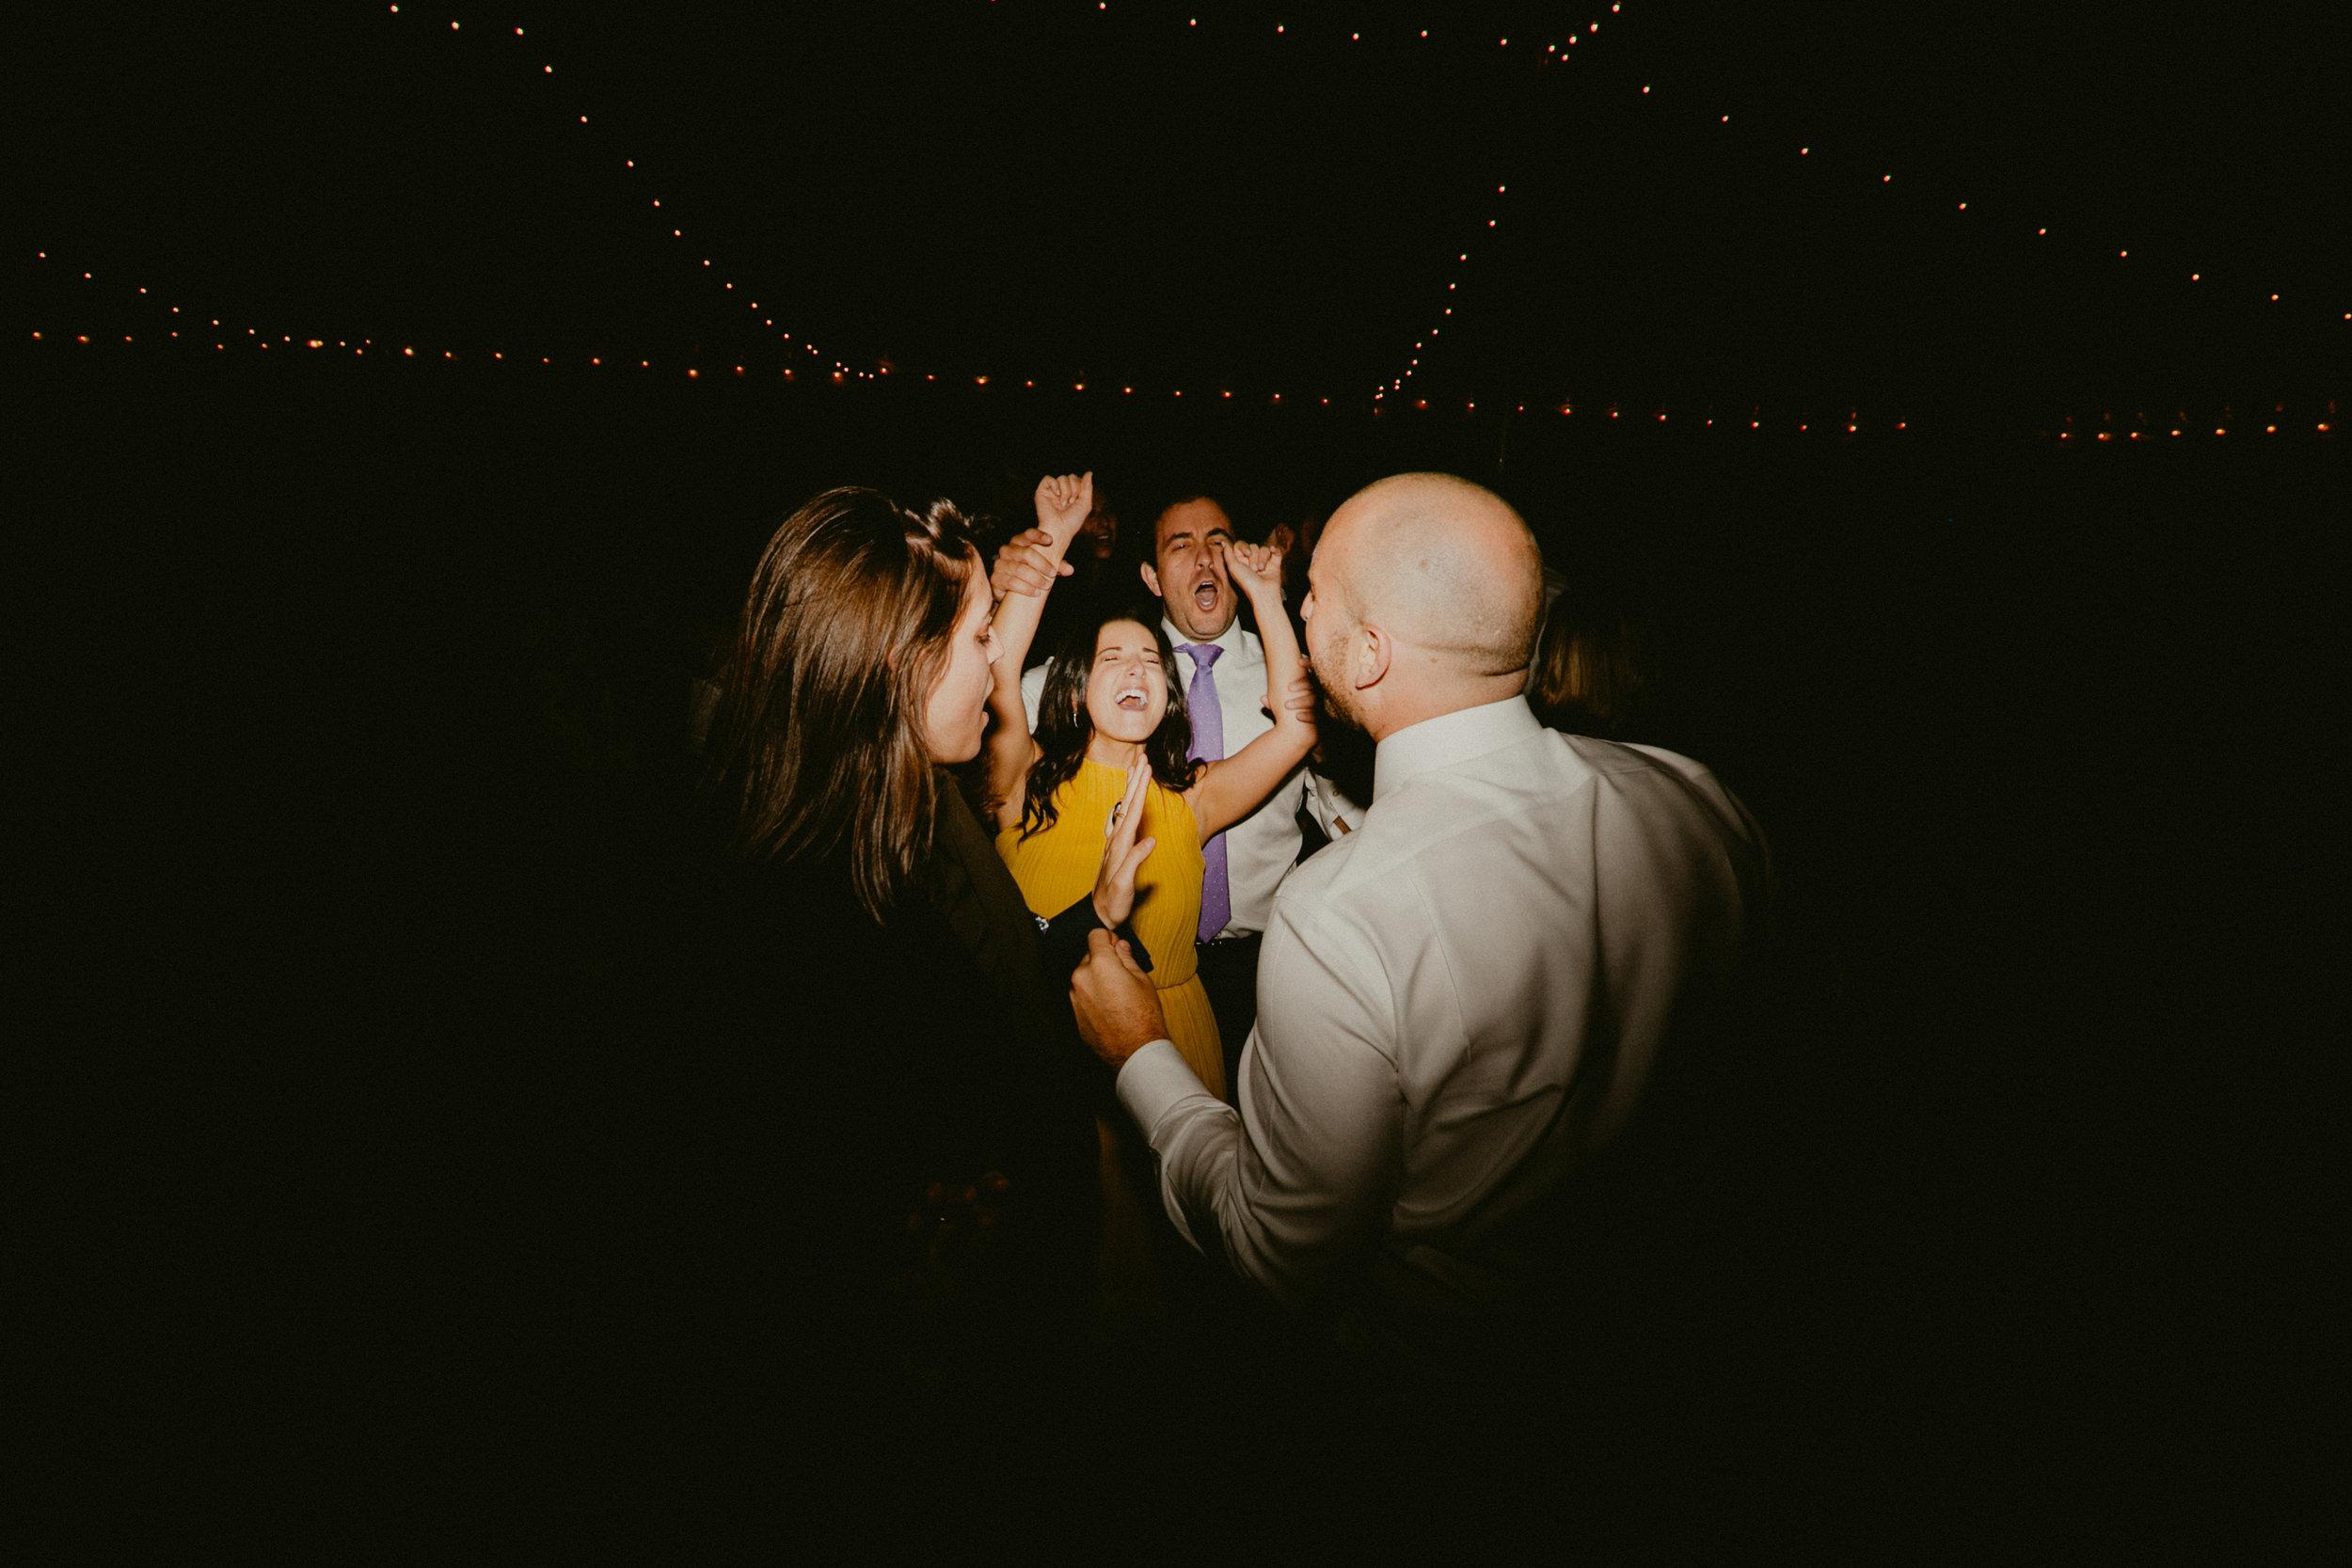 DEER_MOUNTAIN_INN_WEDDING_CHELLISE_MICHAEL_PHOTOGRAPHY-1705.jpg